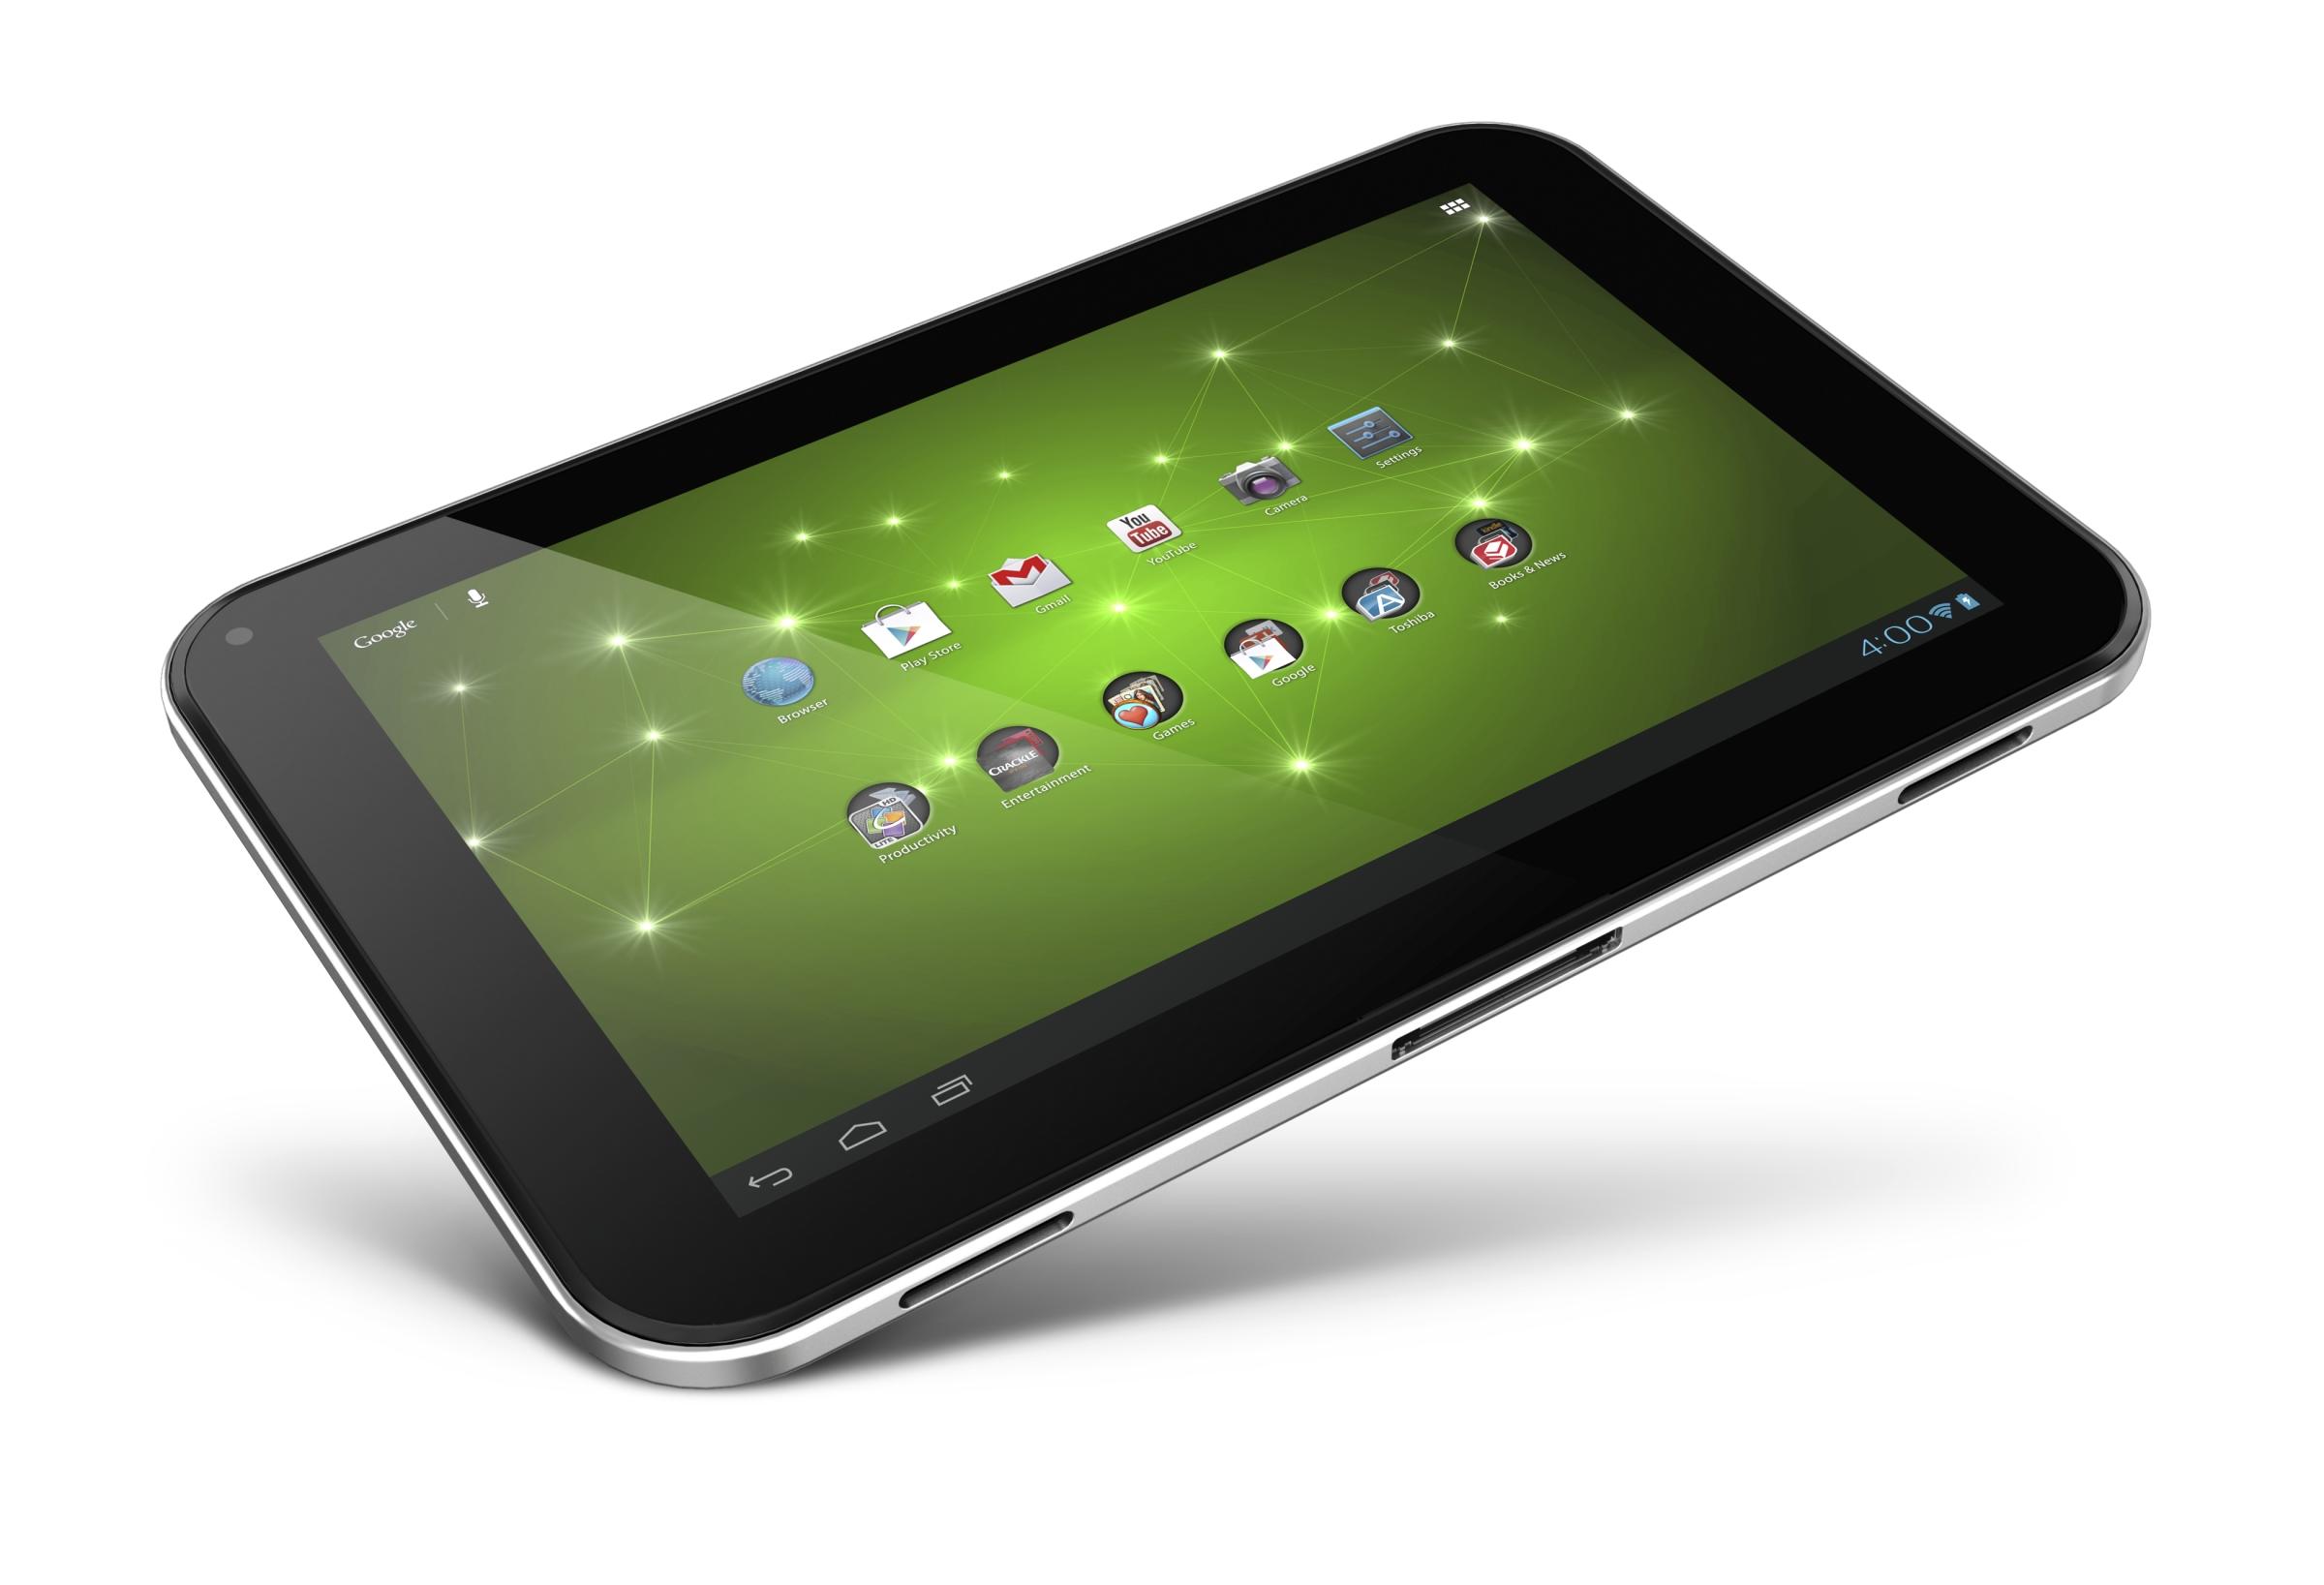 Toshiba Excite 7 Ramaikan Pasar Tablet Android